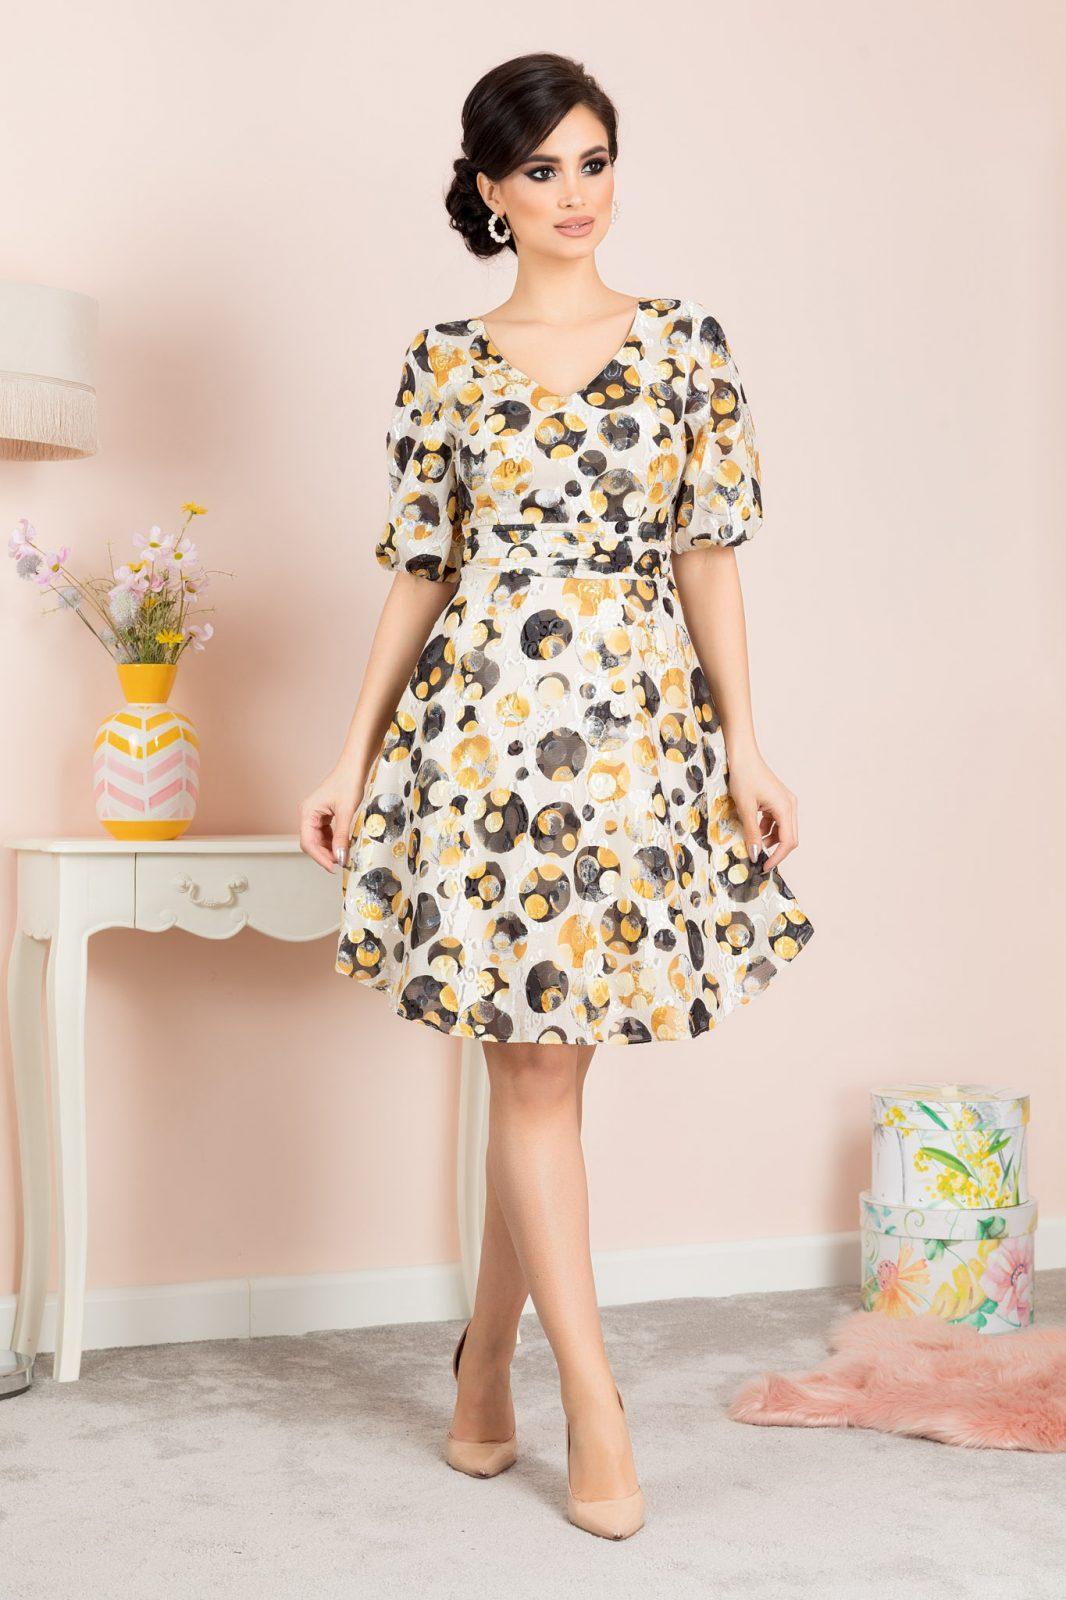 Raven Κίτρινο Φόρεμα 7092